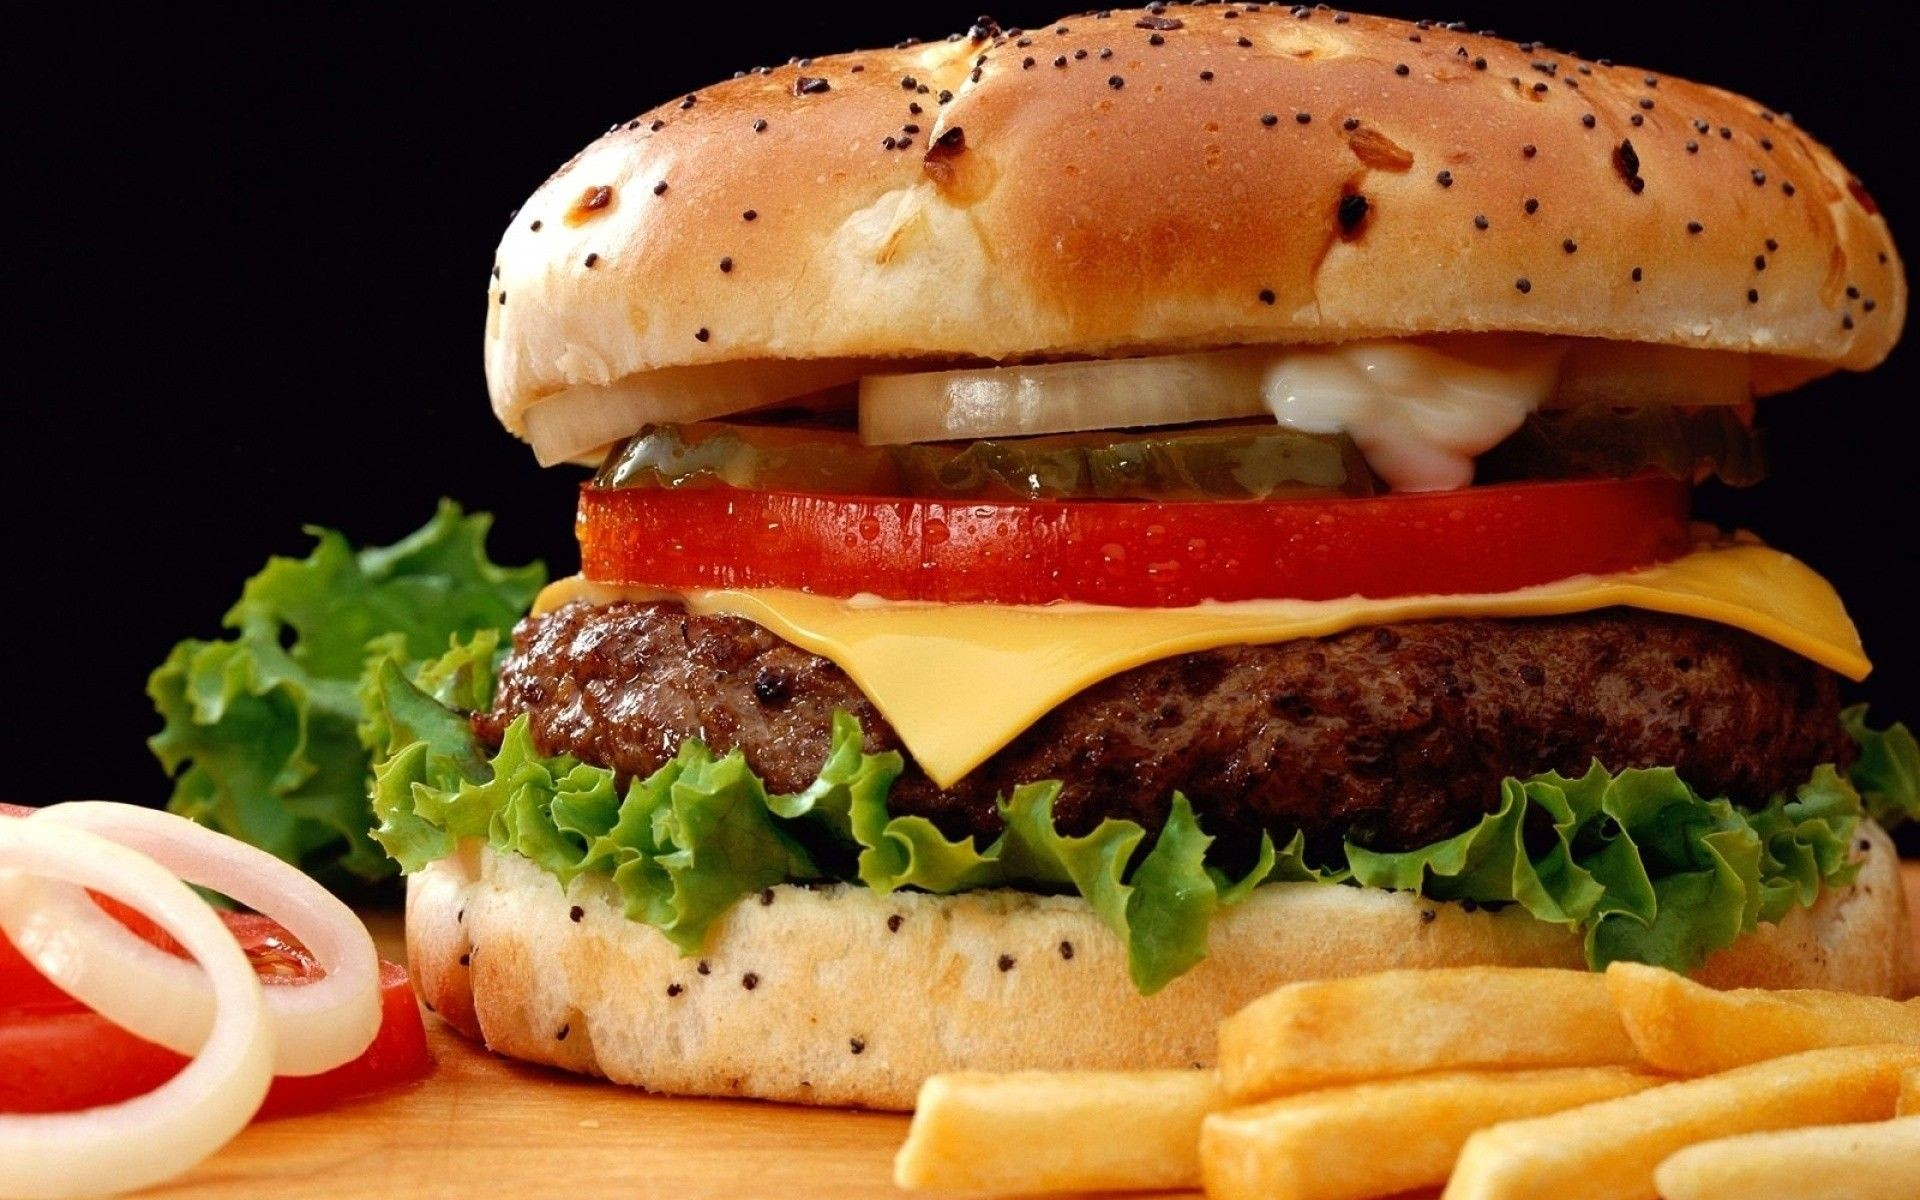 004 Food French Fries Onions Fast Hamburgers Essay Stunning Topics Argumentative Introduction Titles 1920